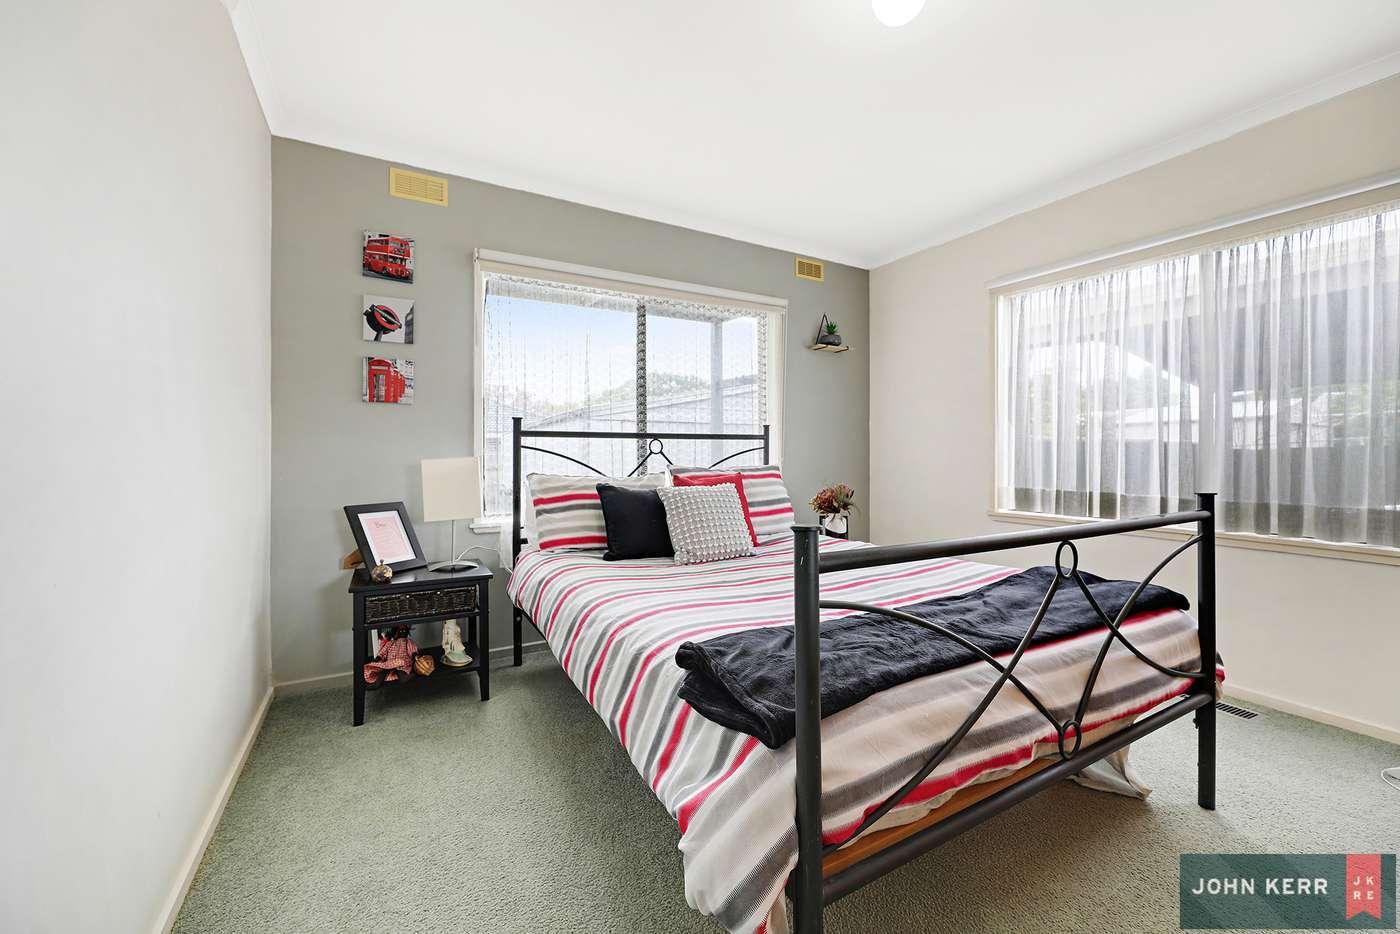 Sixth view of Homely house listing, 20 Kitchener Street, Trafalgar VIC 3824